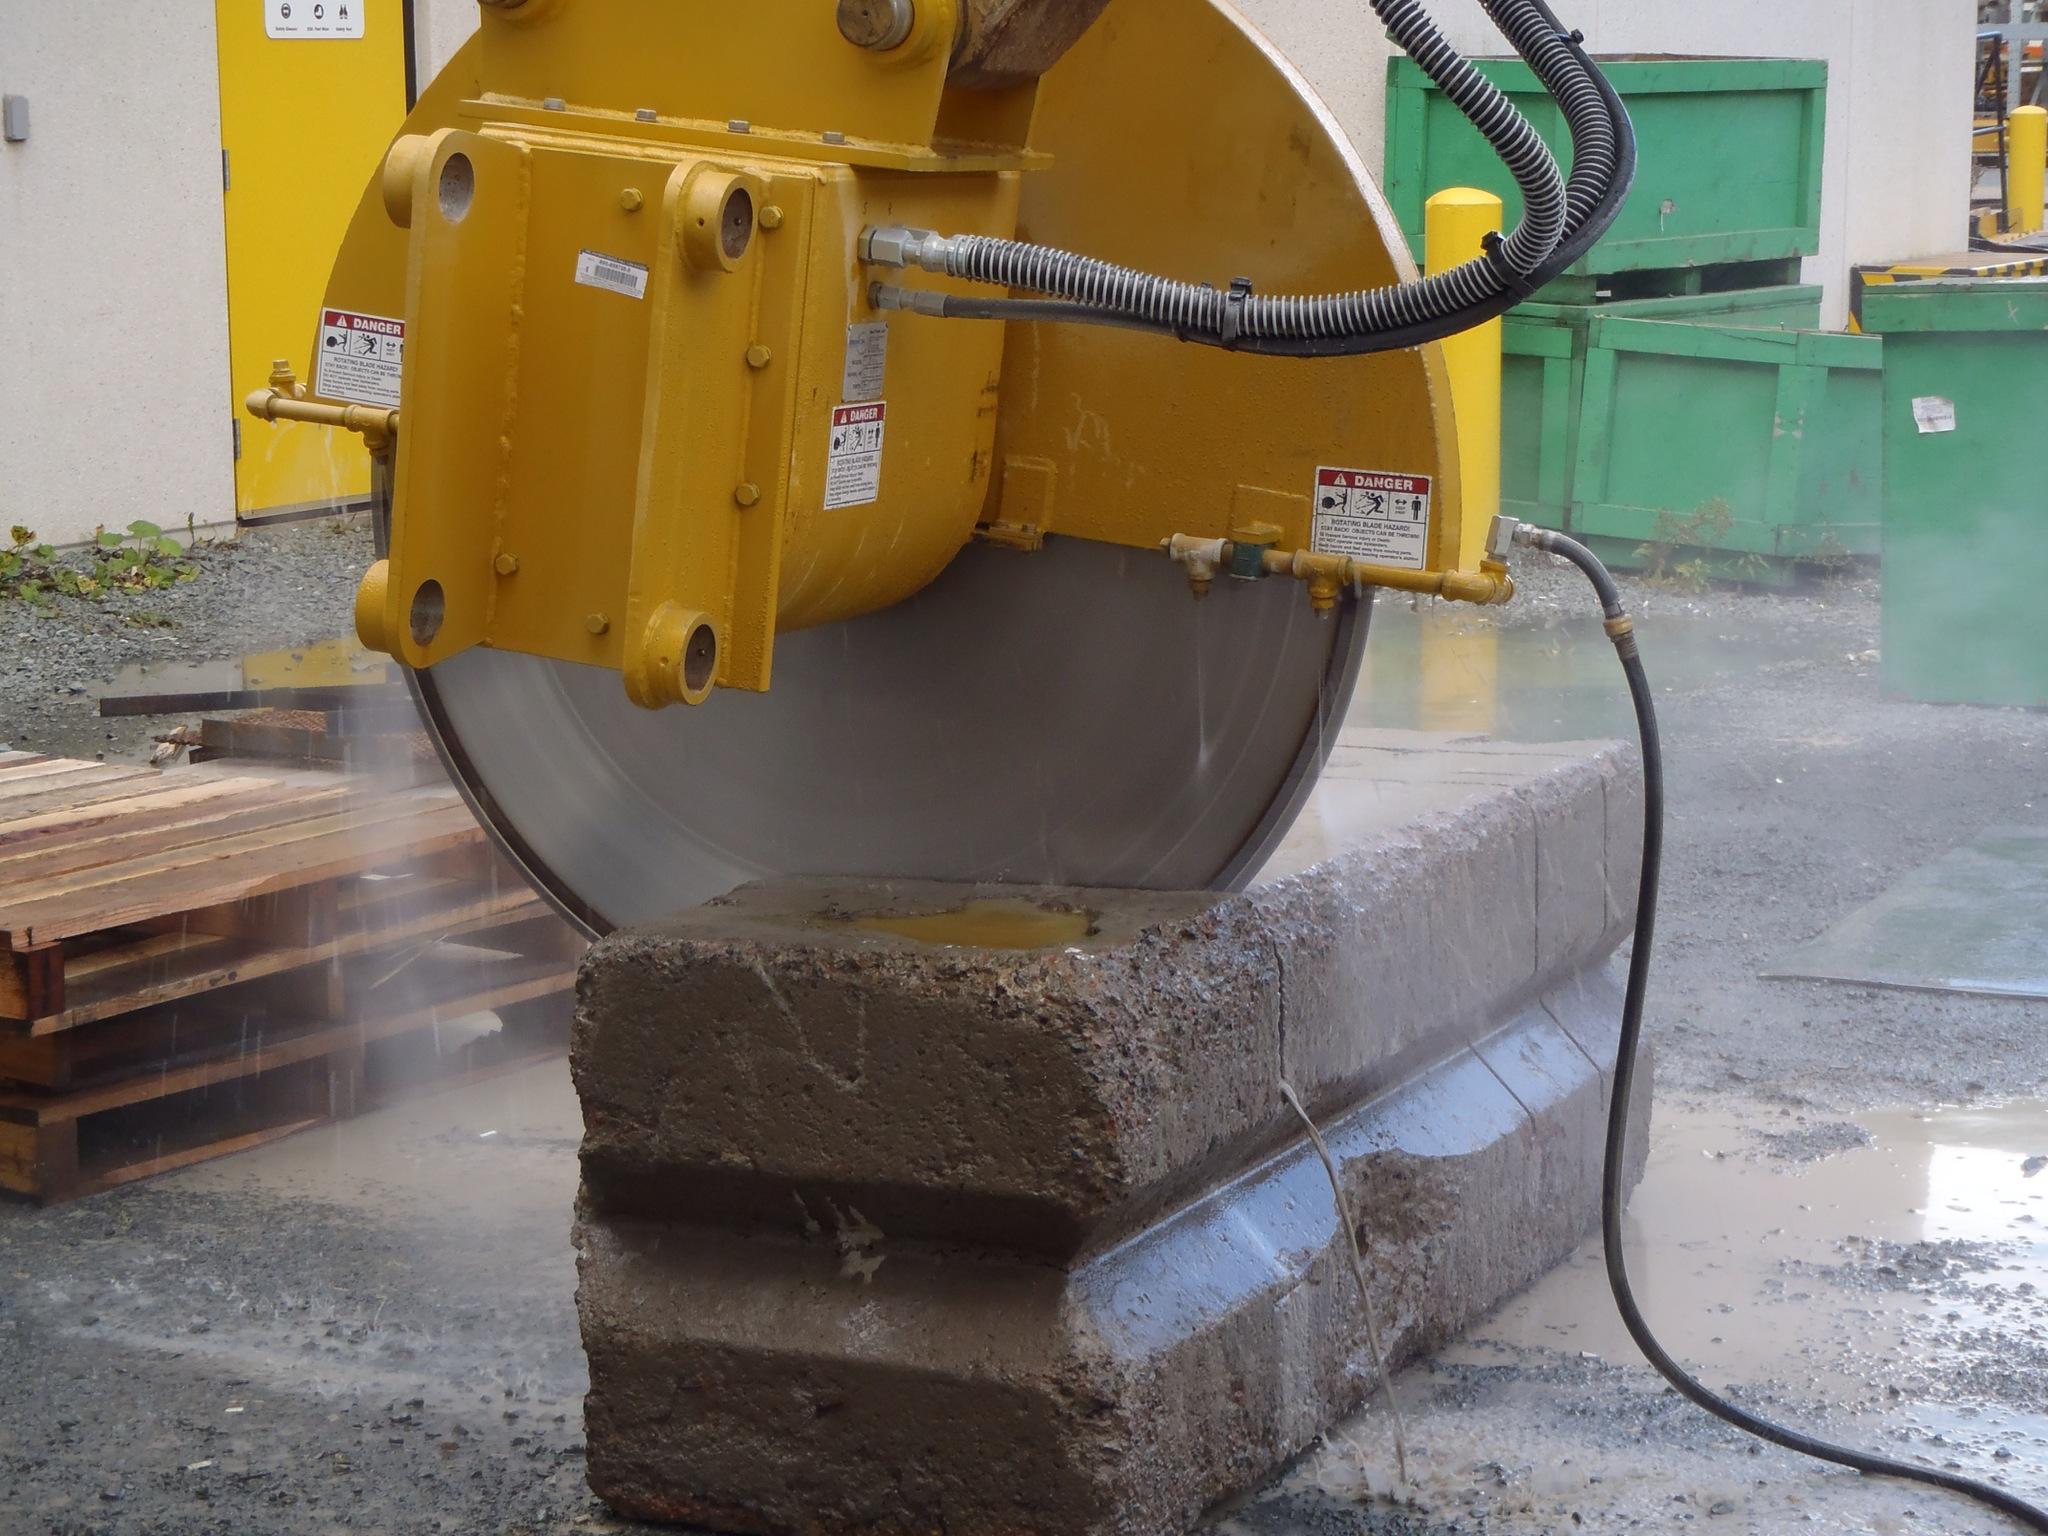 Concrete cutting demo saw